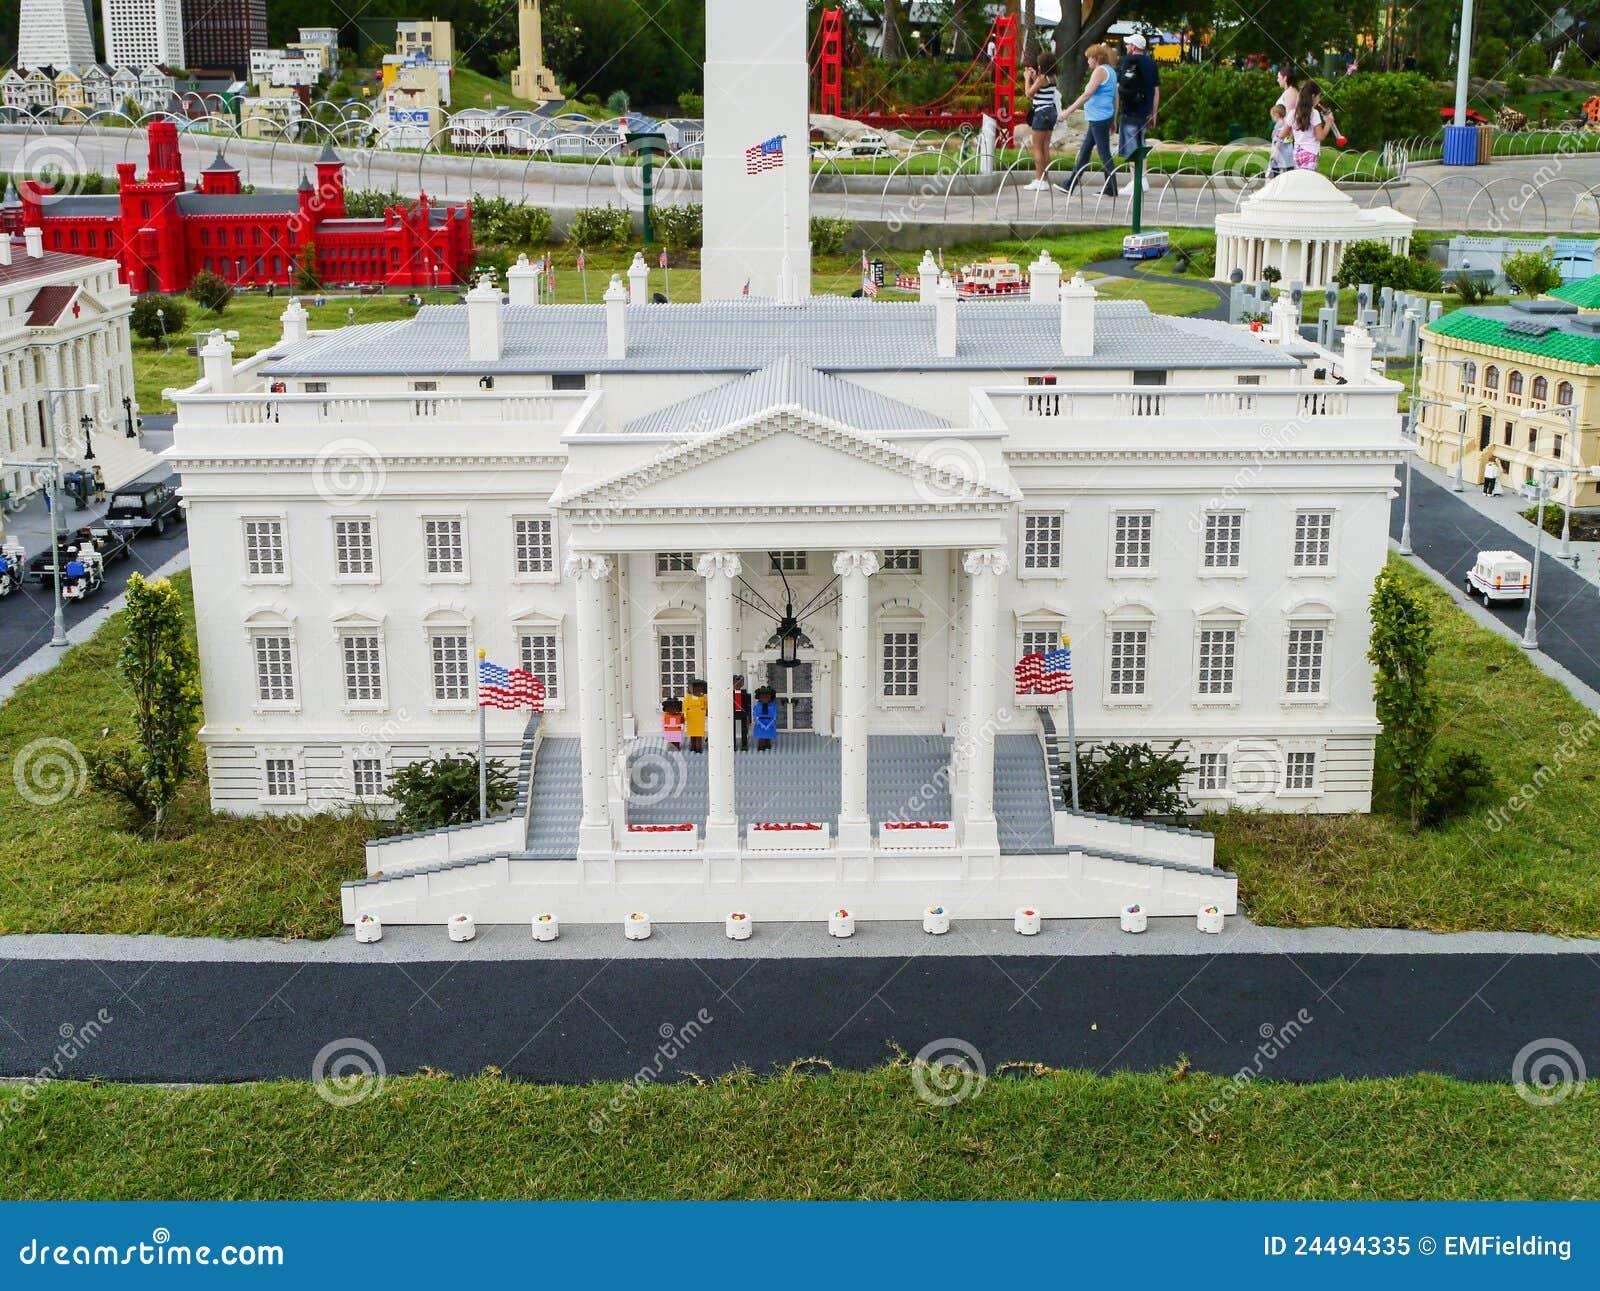 White House Made From Legos At Legoland Florida Le